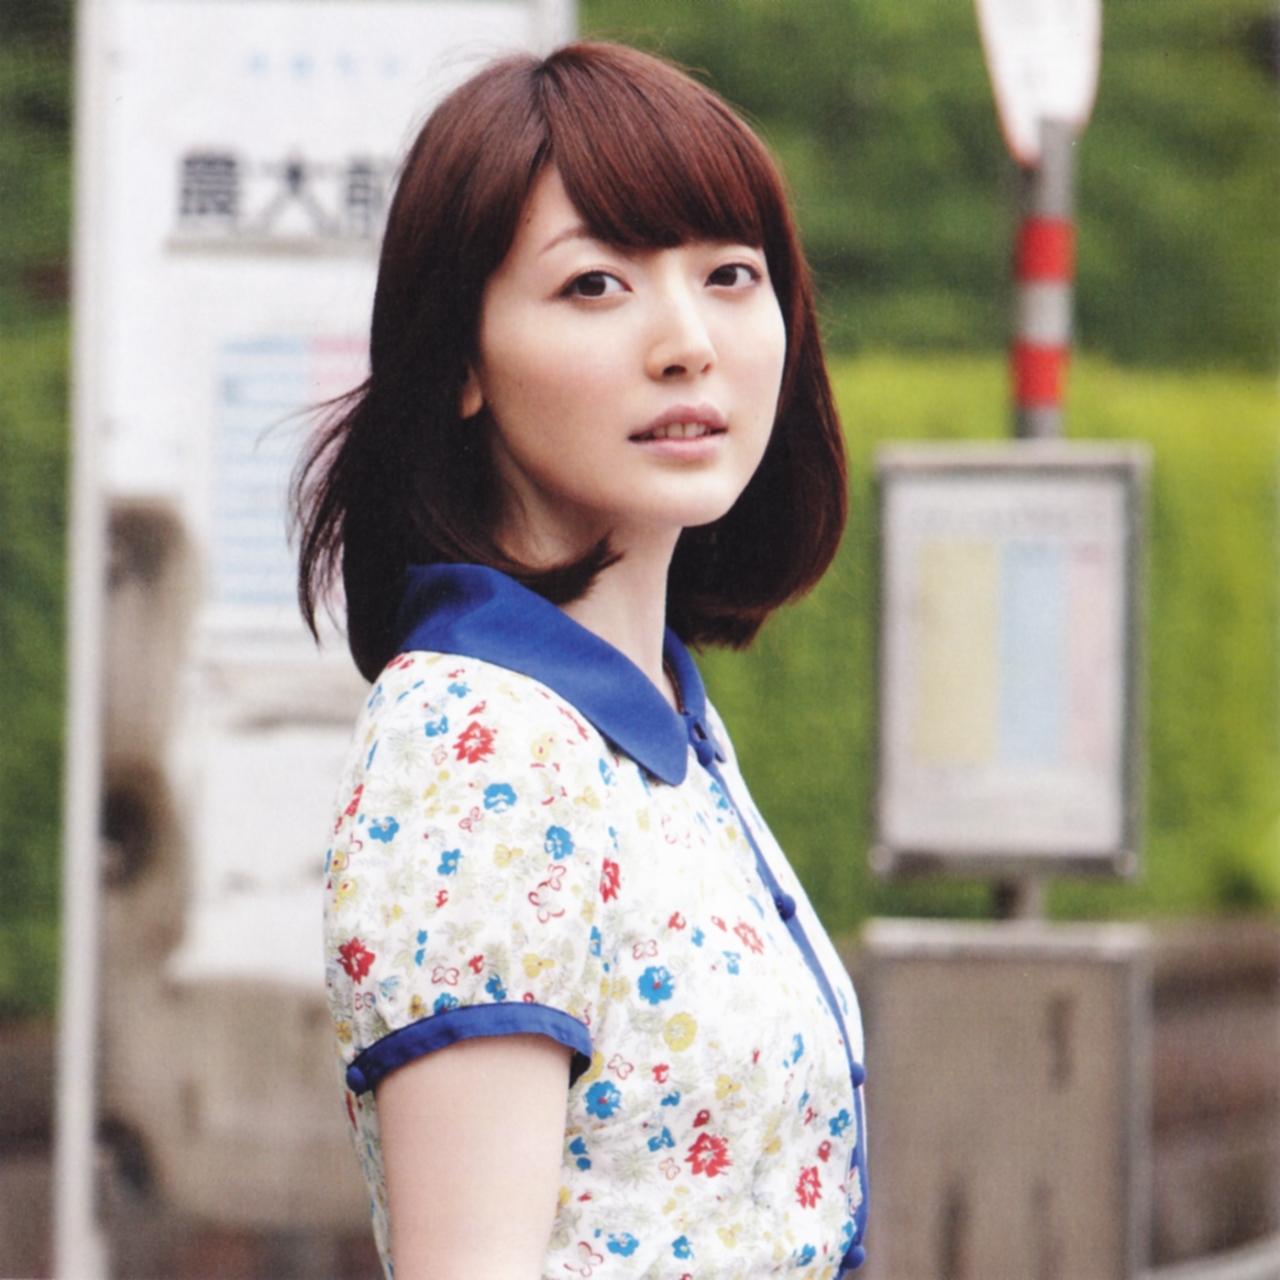 popular voice actor hanazawa image full.jpg - 実は貧乳!?大人気声優の花澤香菜のあれこれ